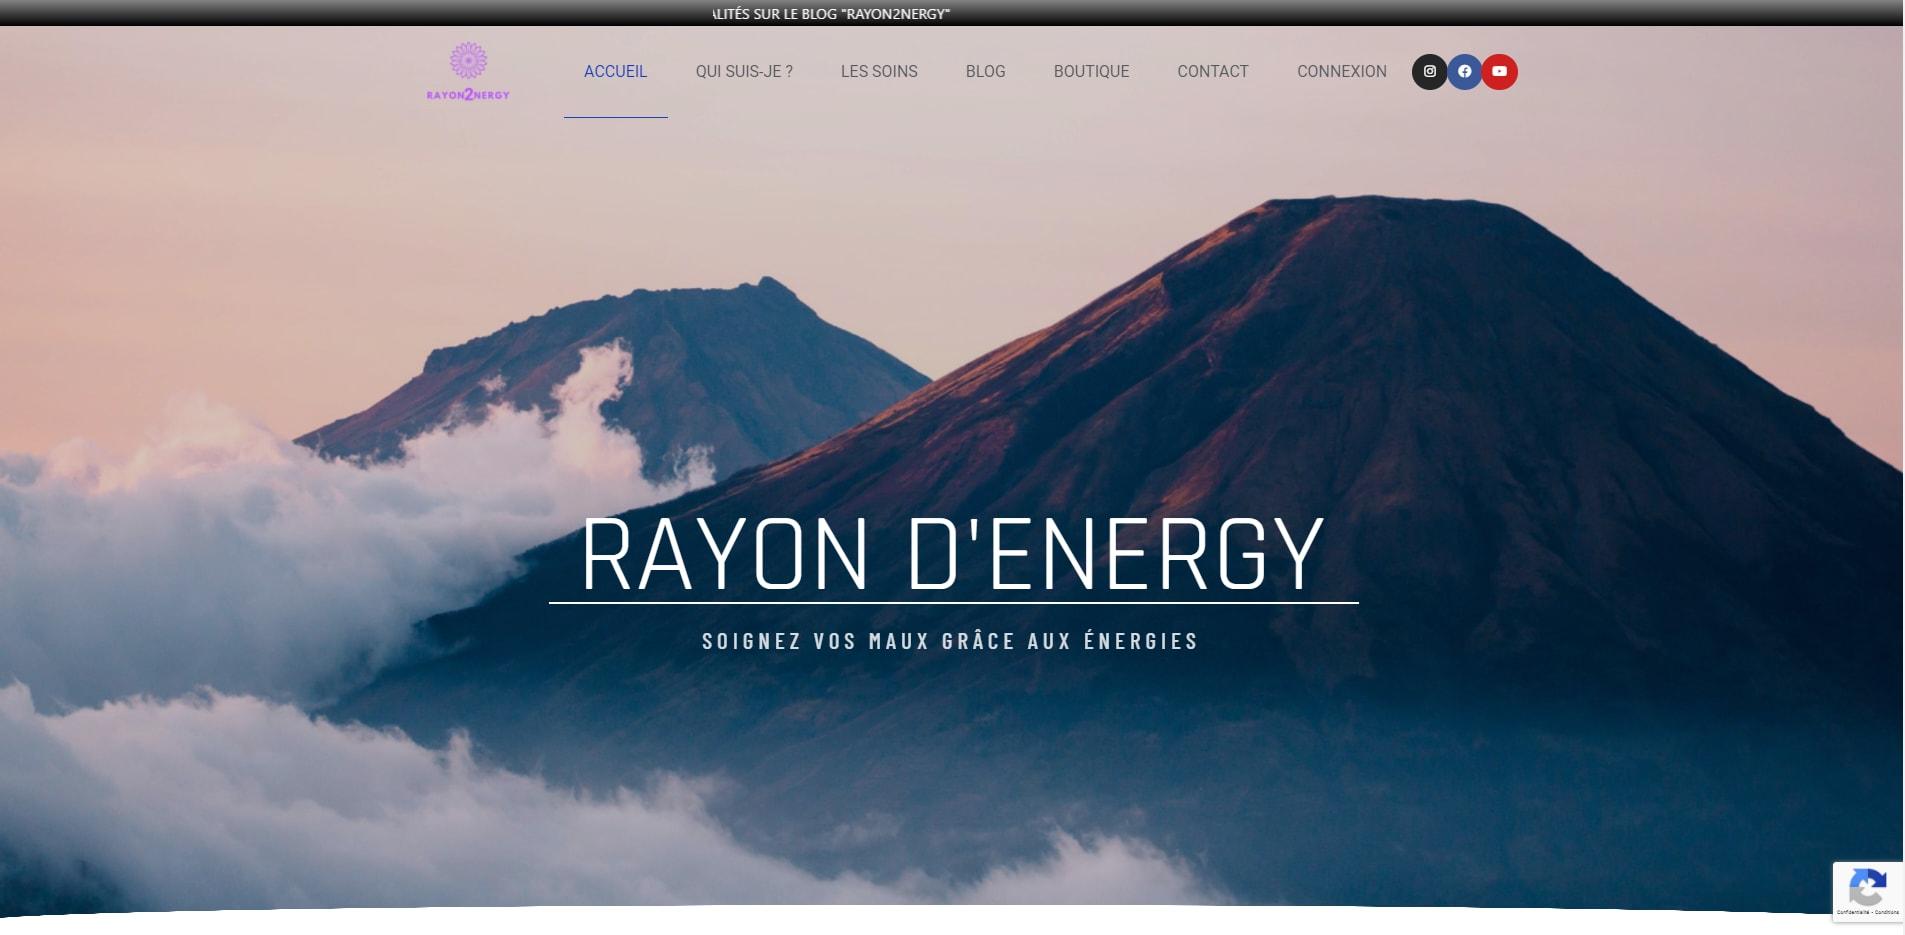 Rayon2nergy